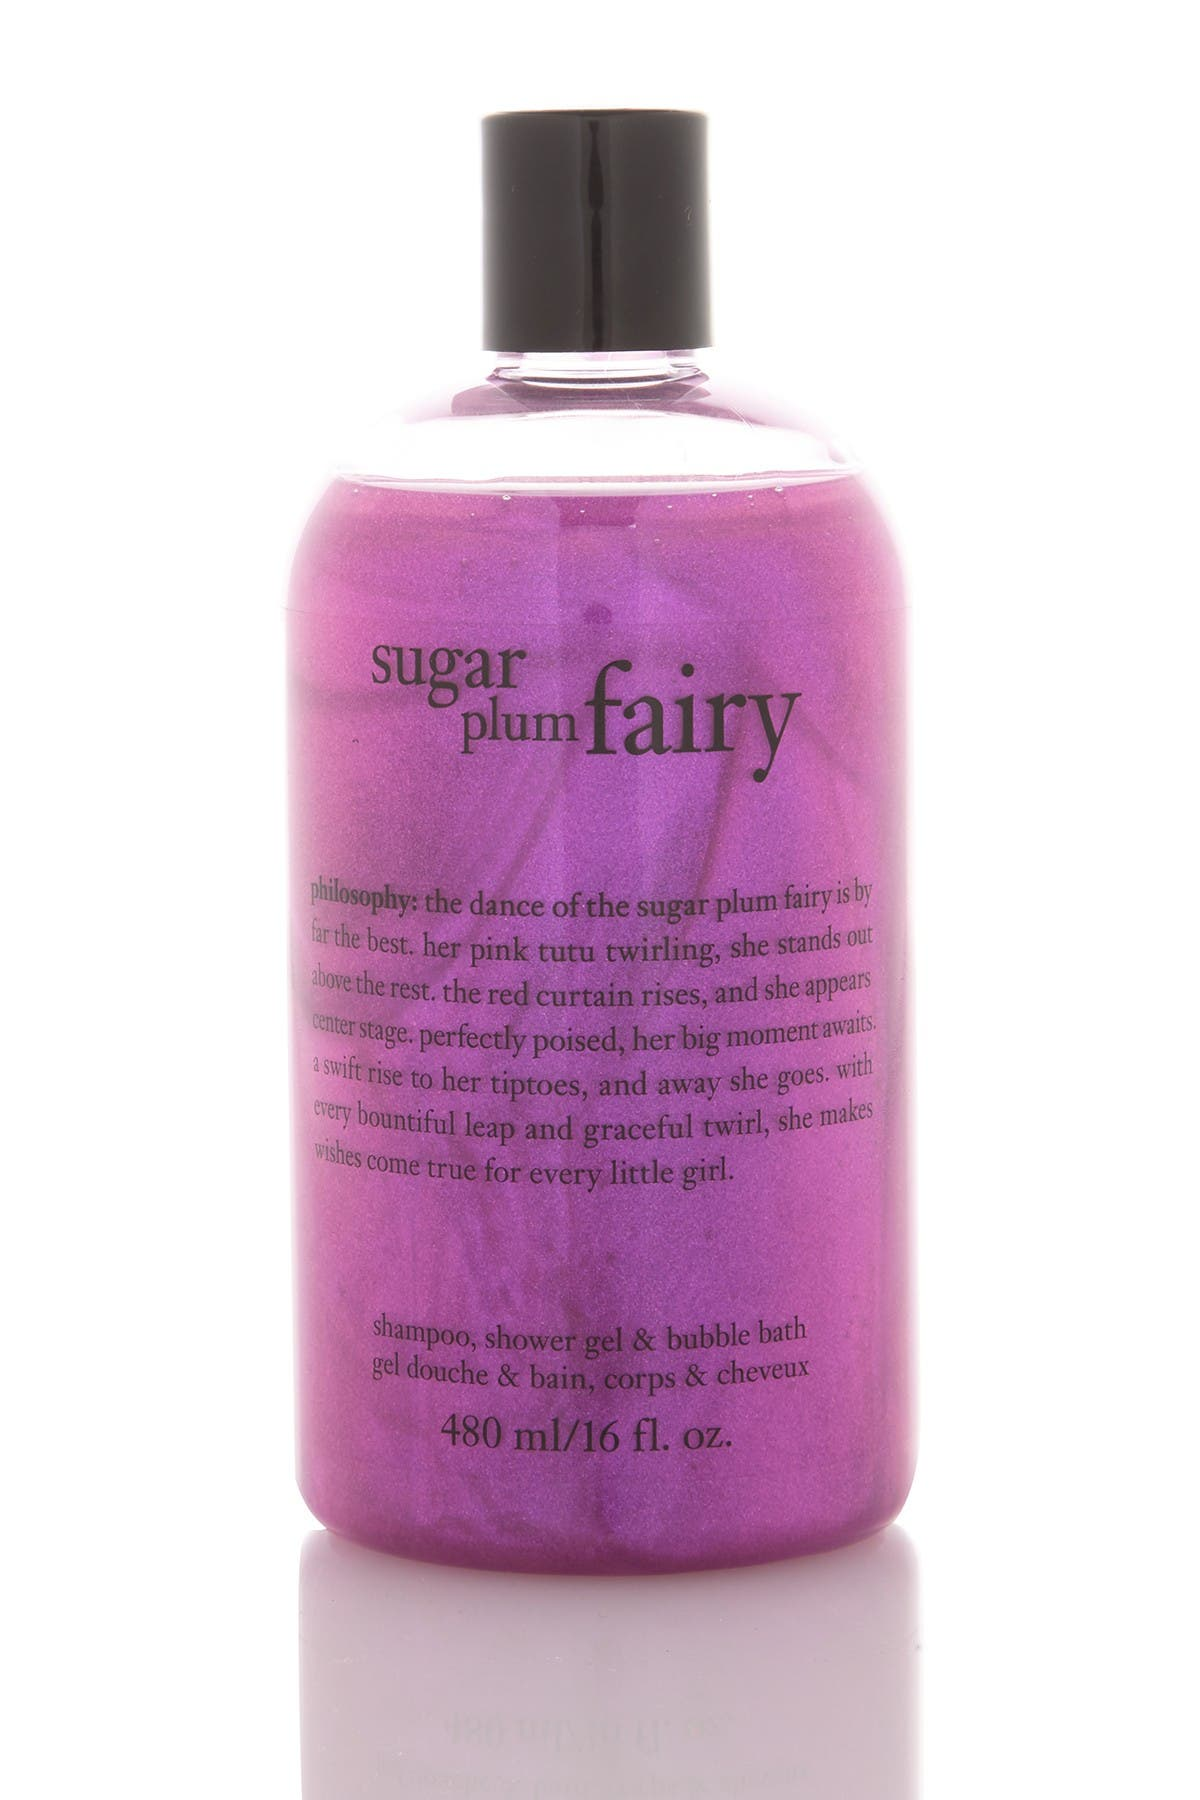 Image of philosophy sugar plum fairy 3-in-1 shower gel - 16 oz.